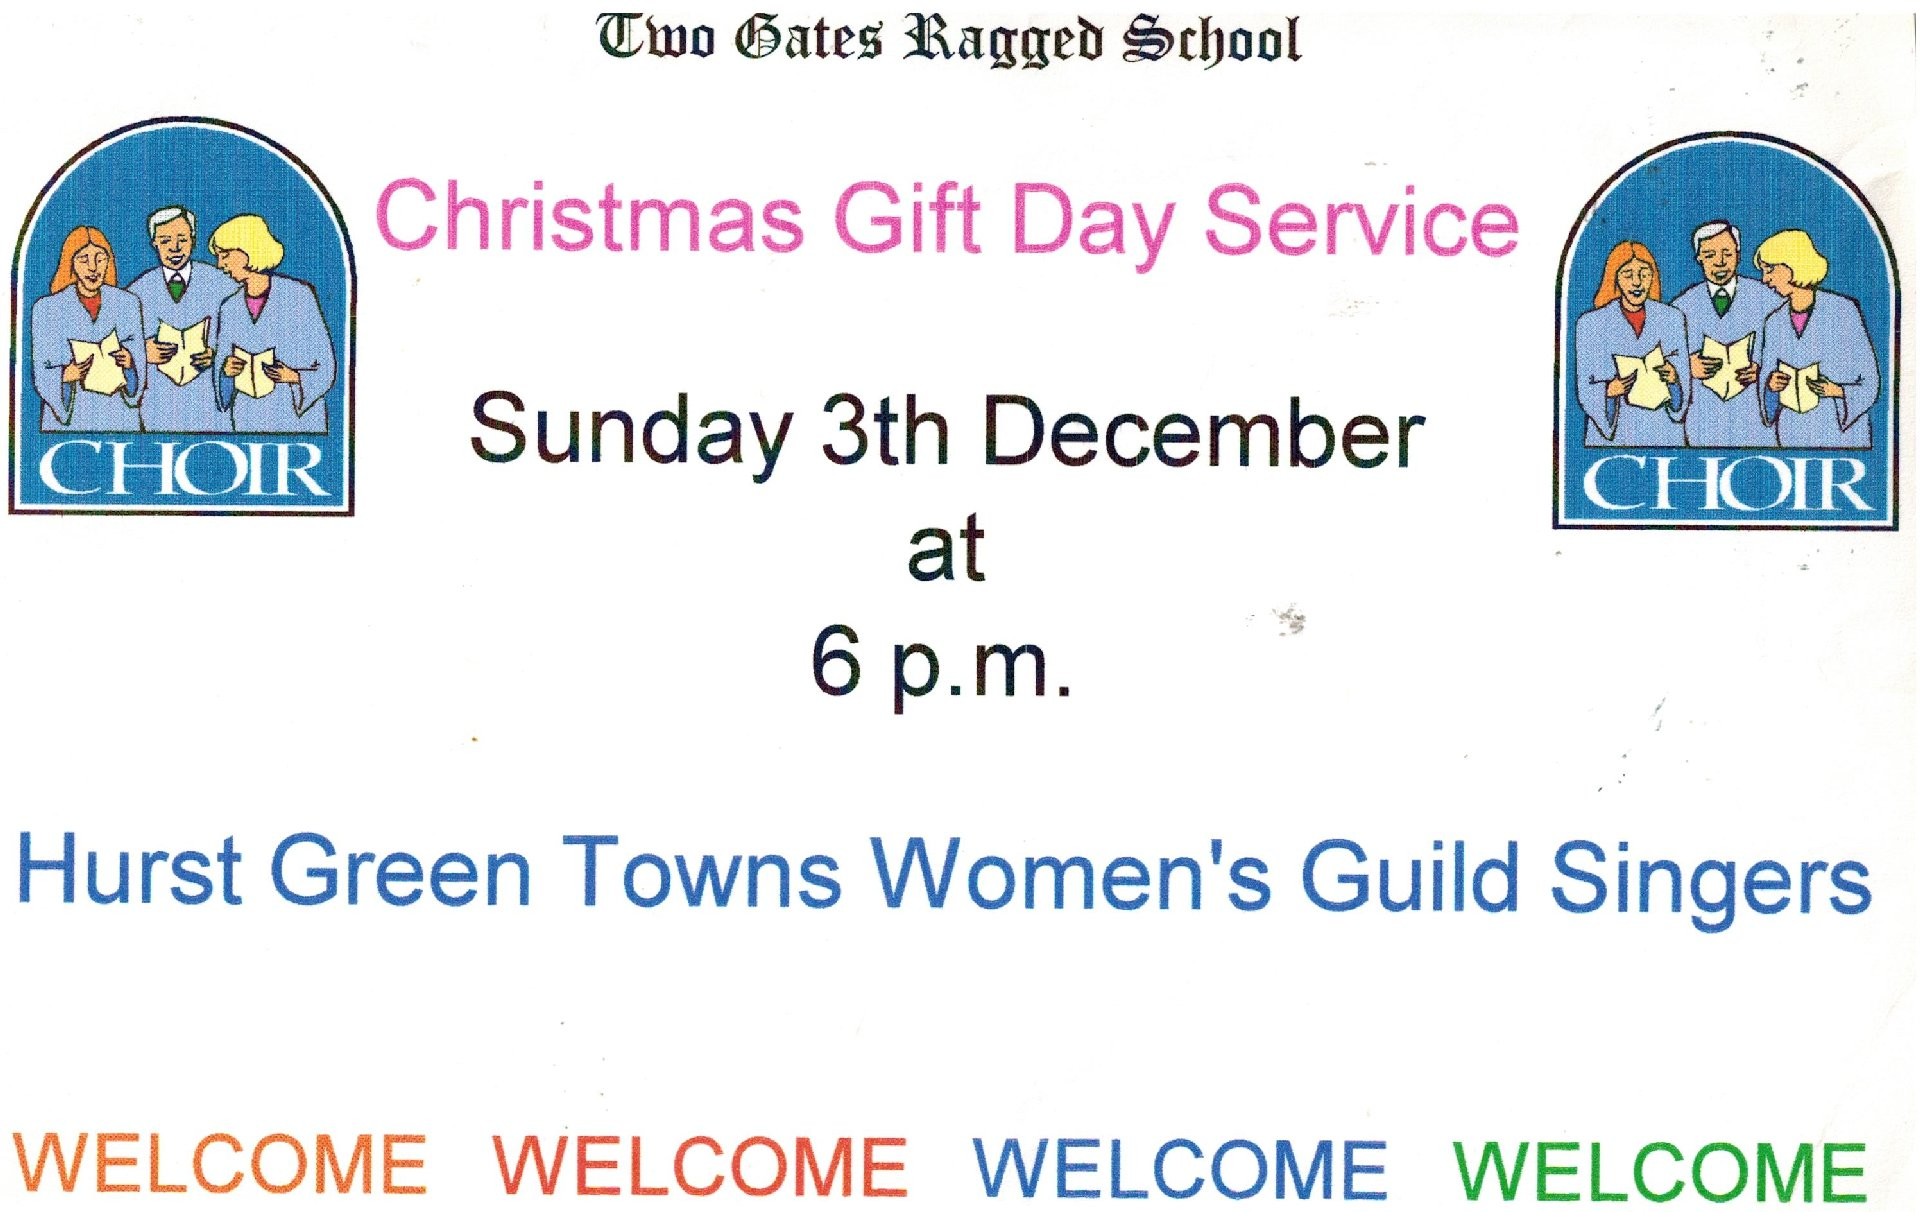 J044_Gift-Day-Flyer_Xmas[Dec-2000]